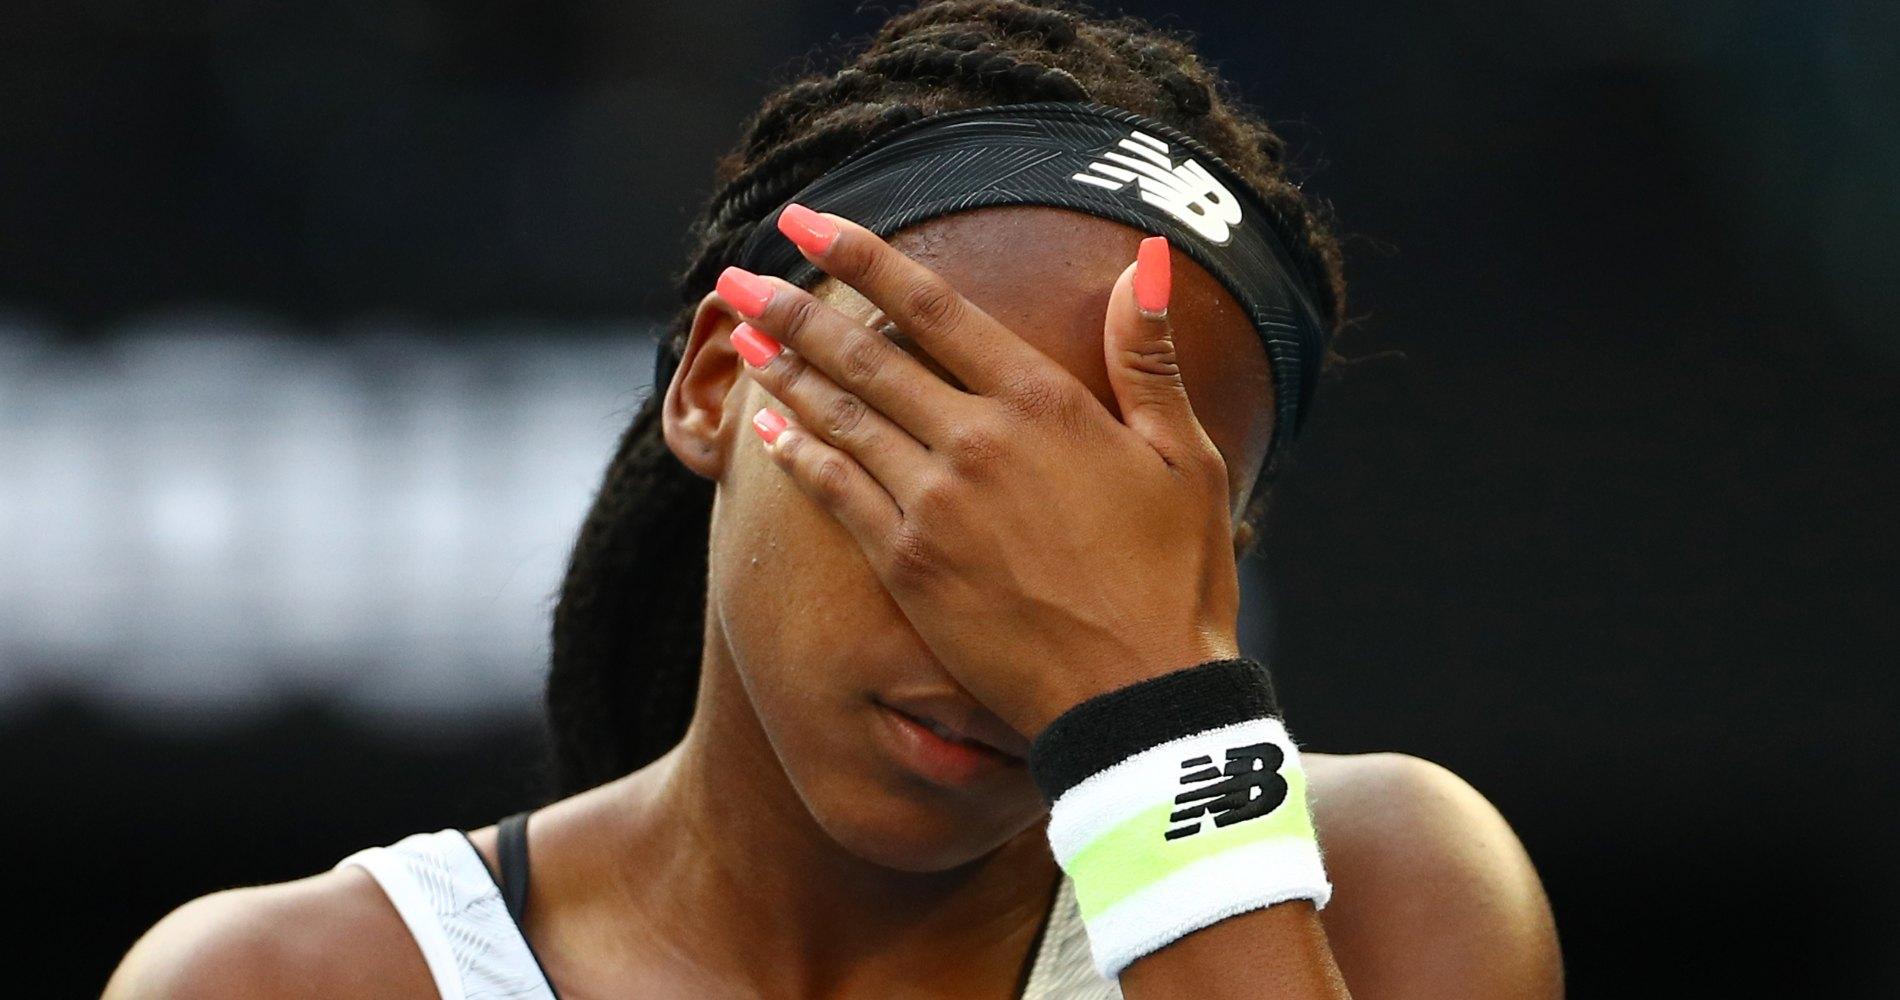 Gauff - WTA